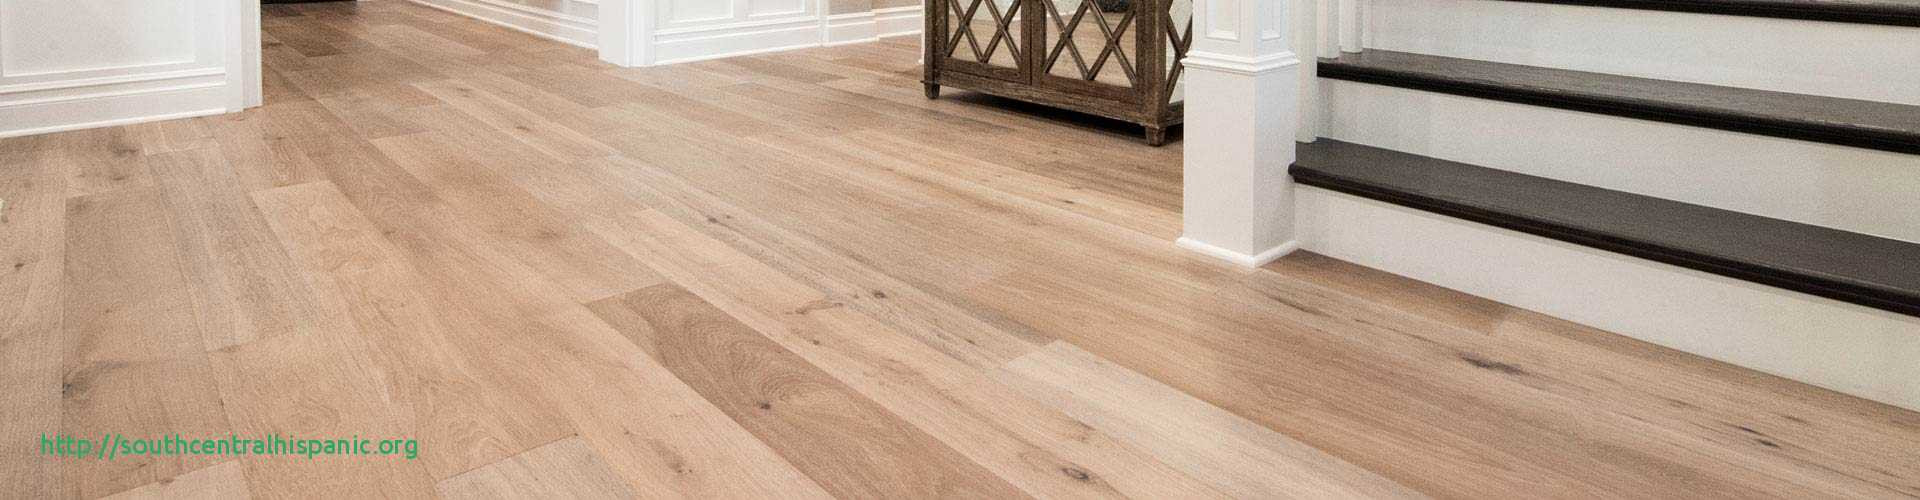 maple hardwood flooring of orange glo hardwood floor refinisher a‰lagant antique medium brown in orange glo hardwood floor refinisher unique captivating hardwood floor cleaning 0